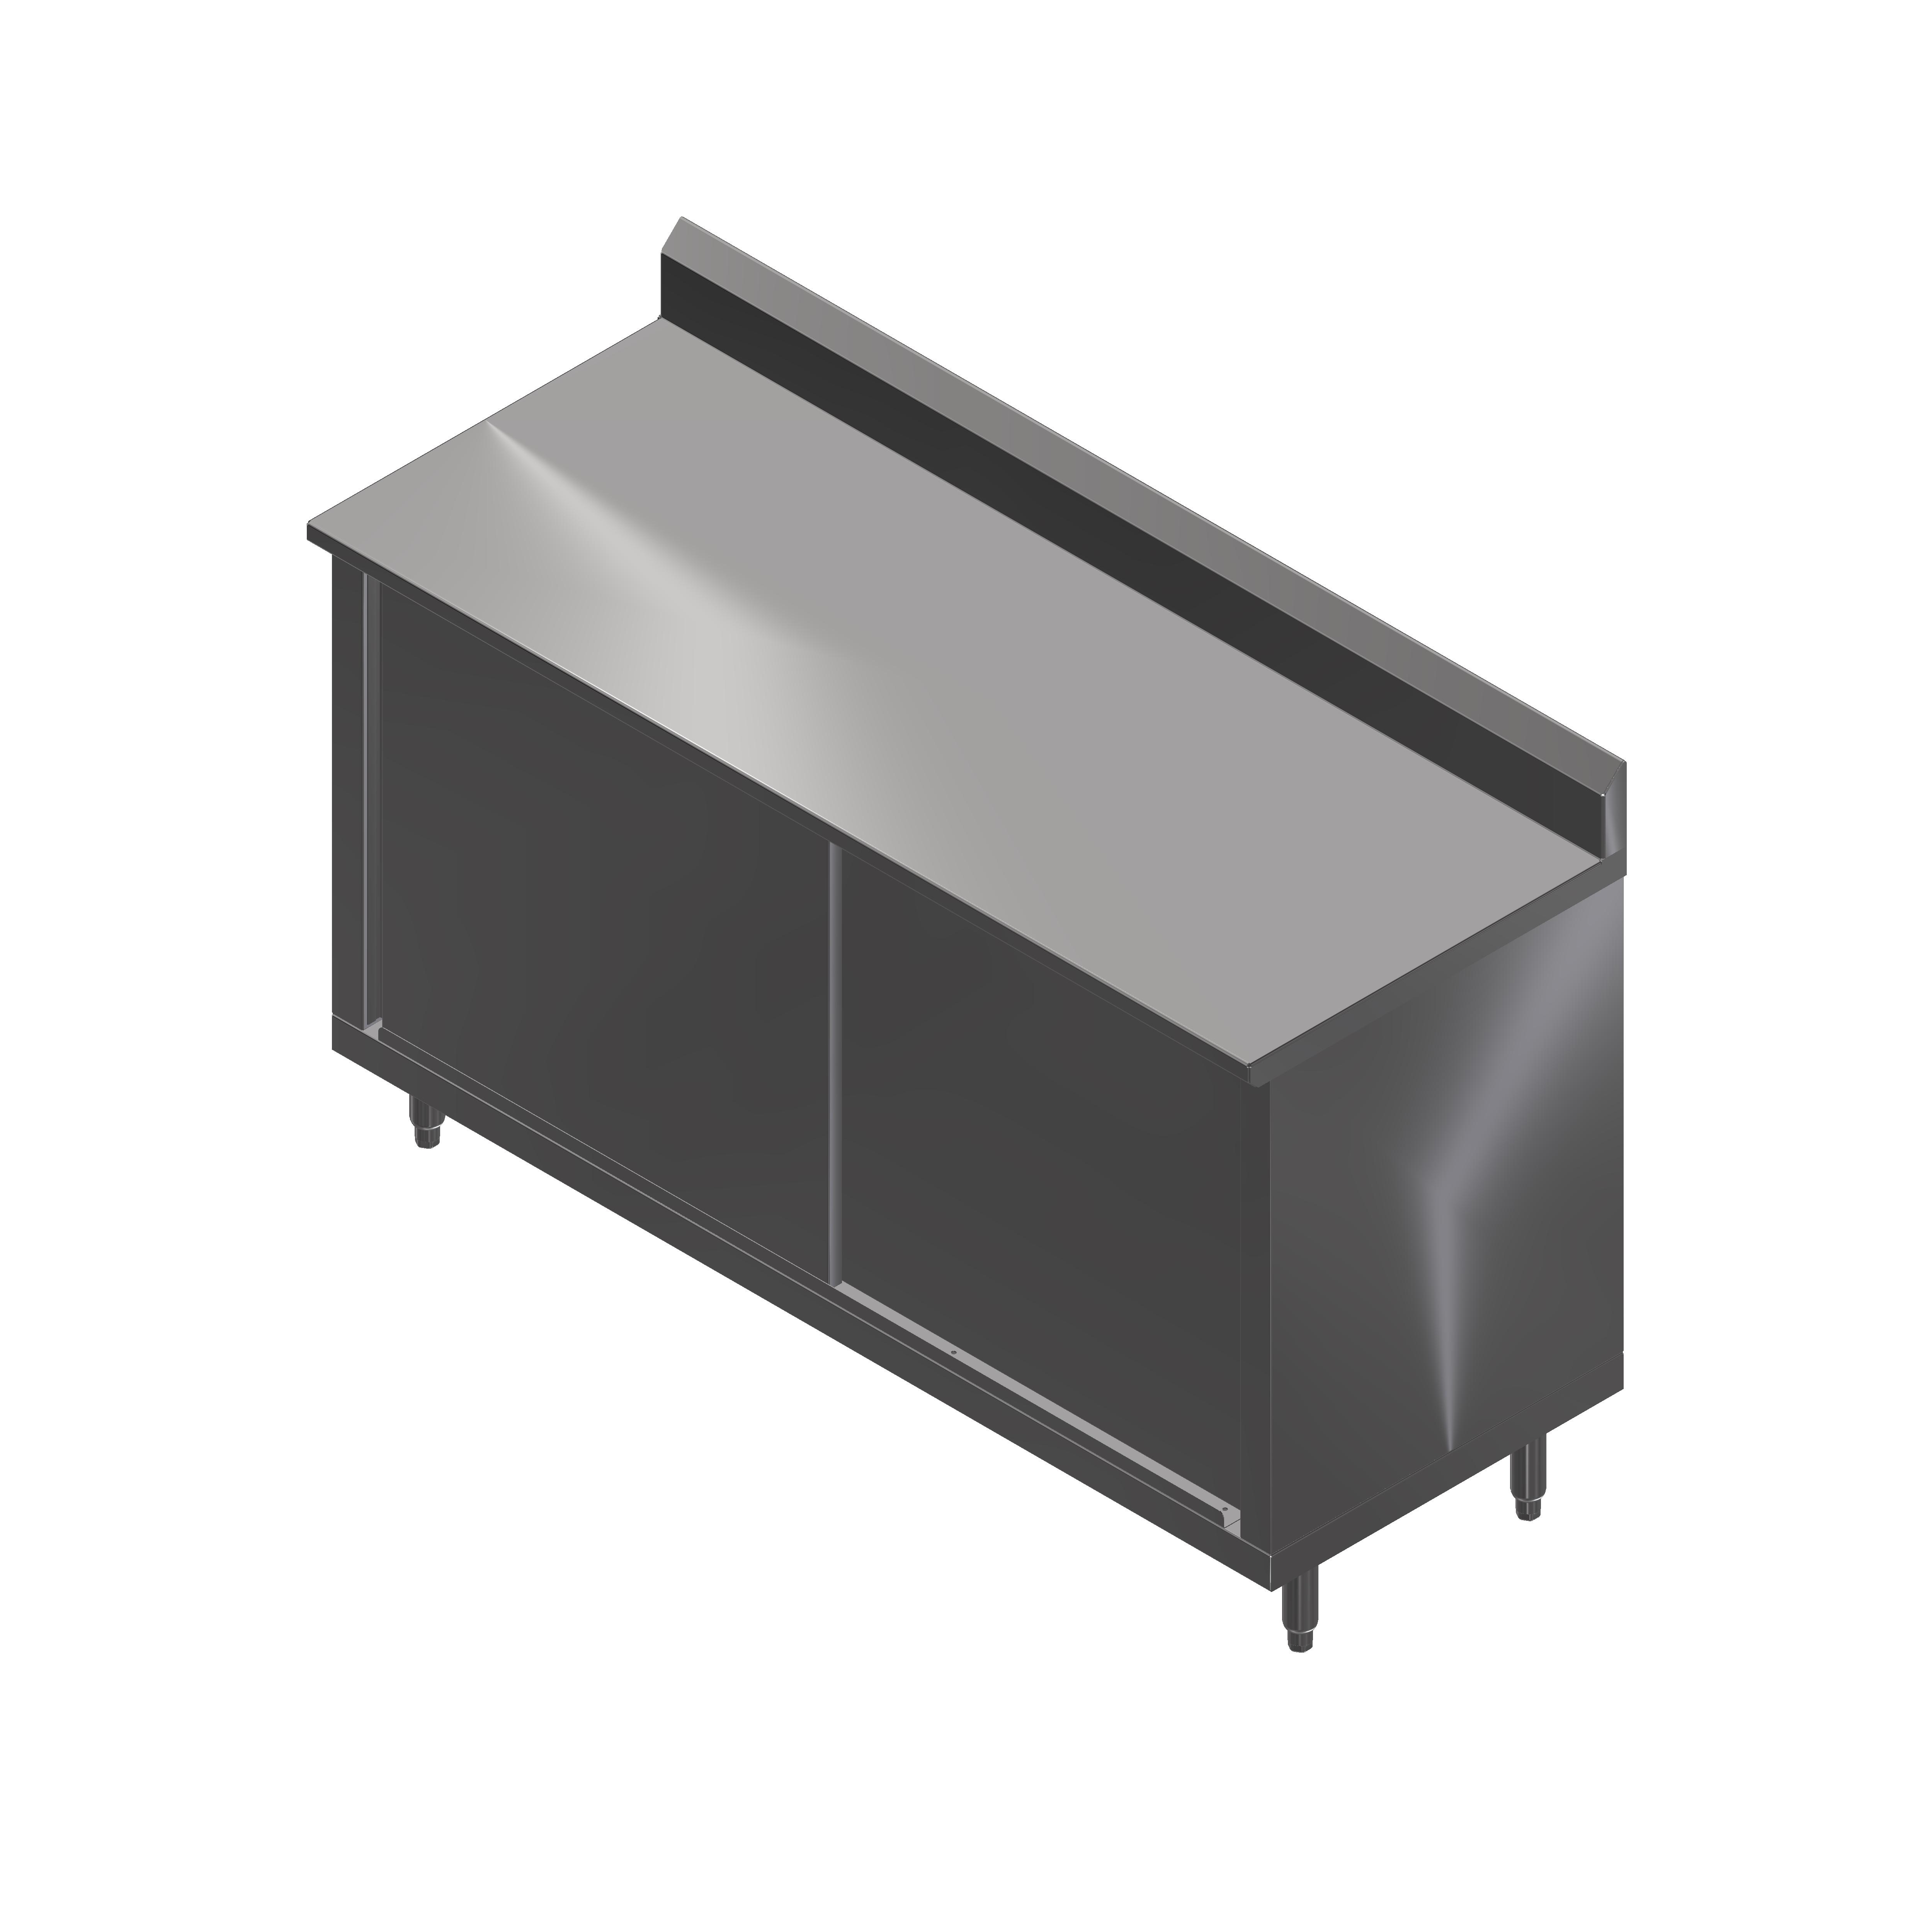 John Boos 4CS4R5-3648 work table, cabinet base sliding doors